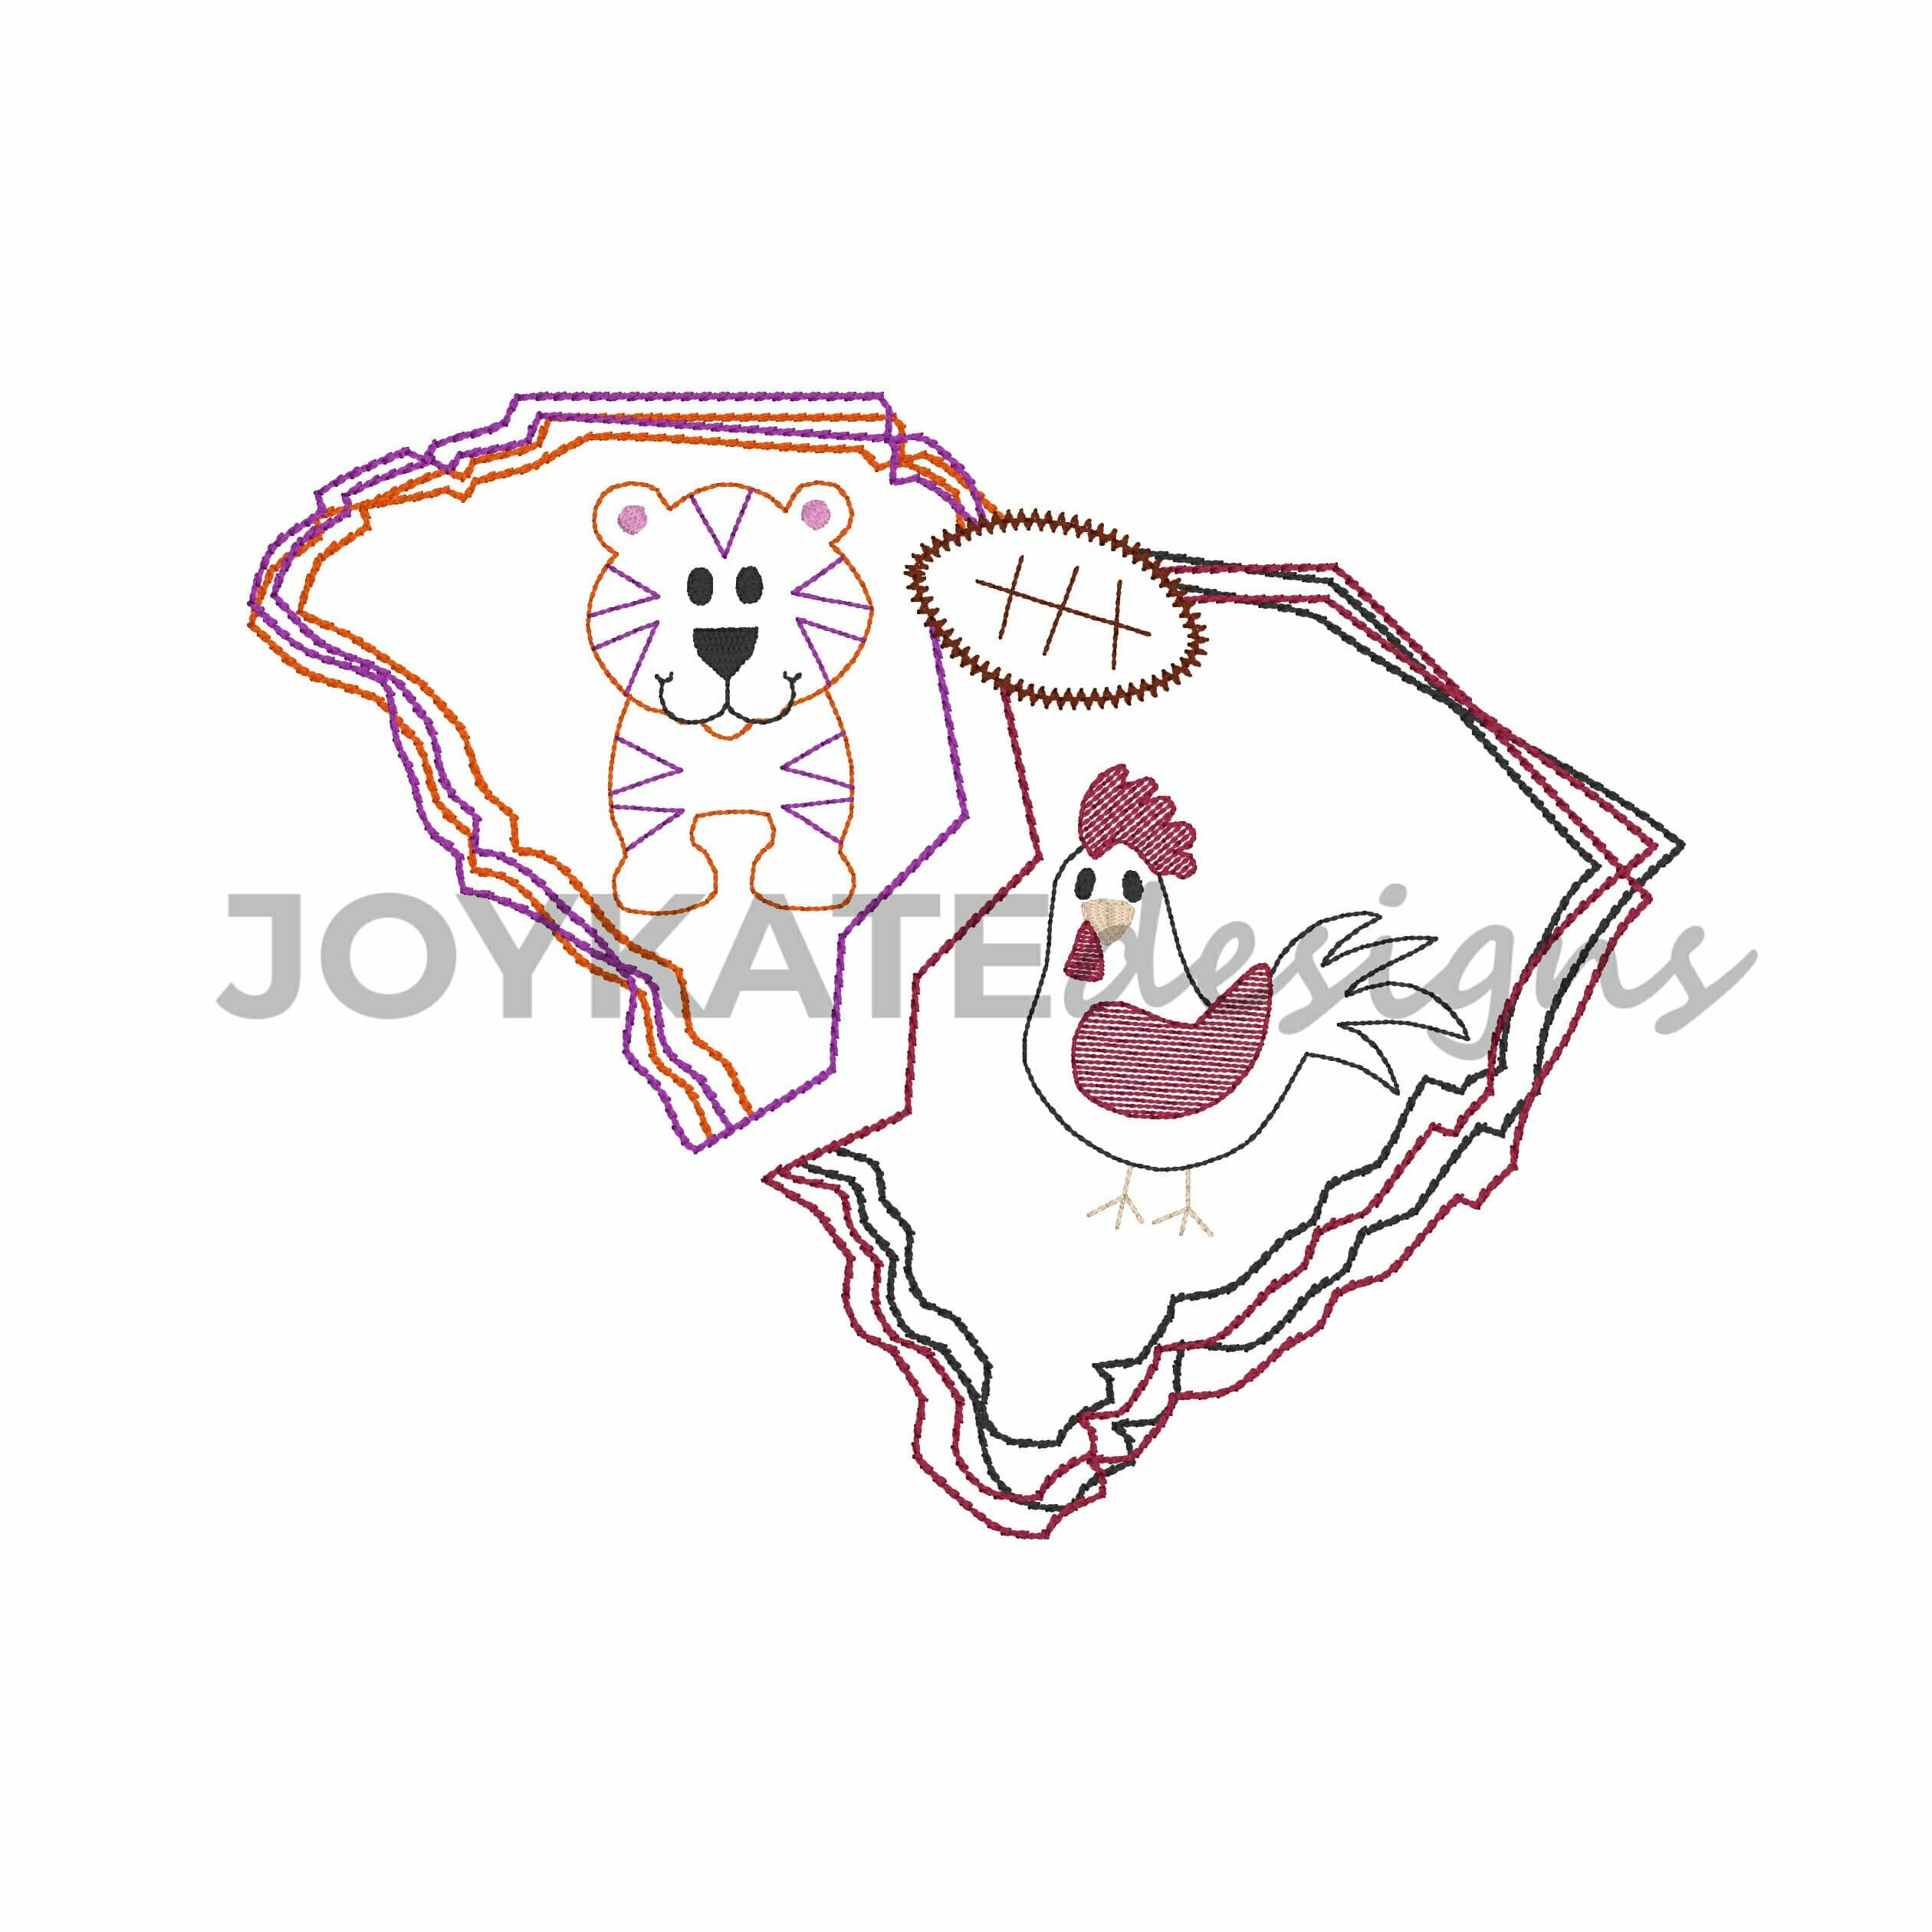 House Divided South Carolina Vintage Embroidery Design Joy Kate